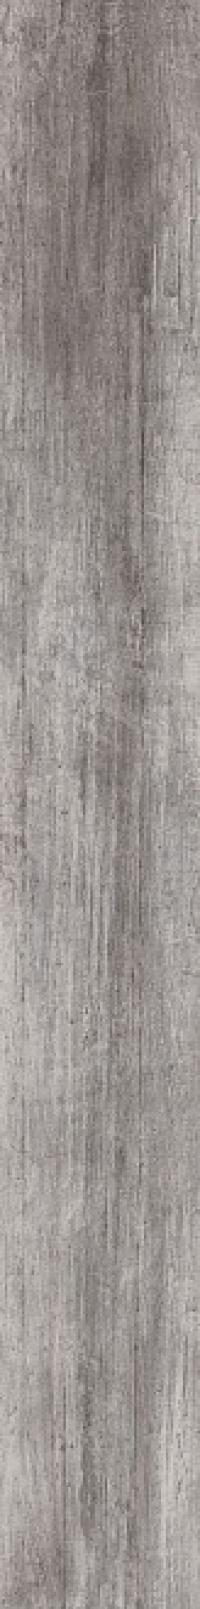 Плитка Kerama Marazzi Антик Вуд DL750600R